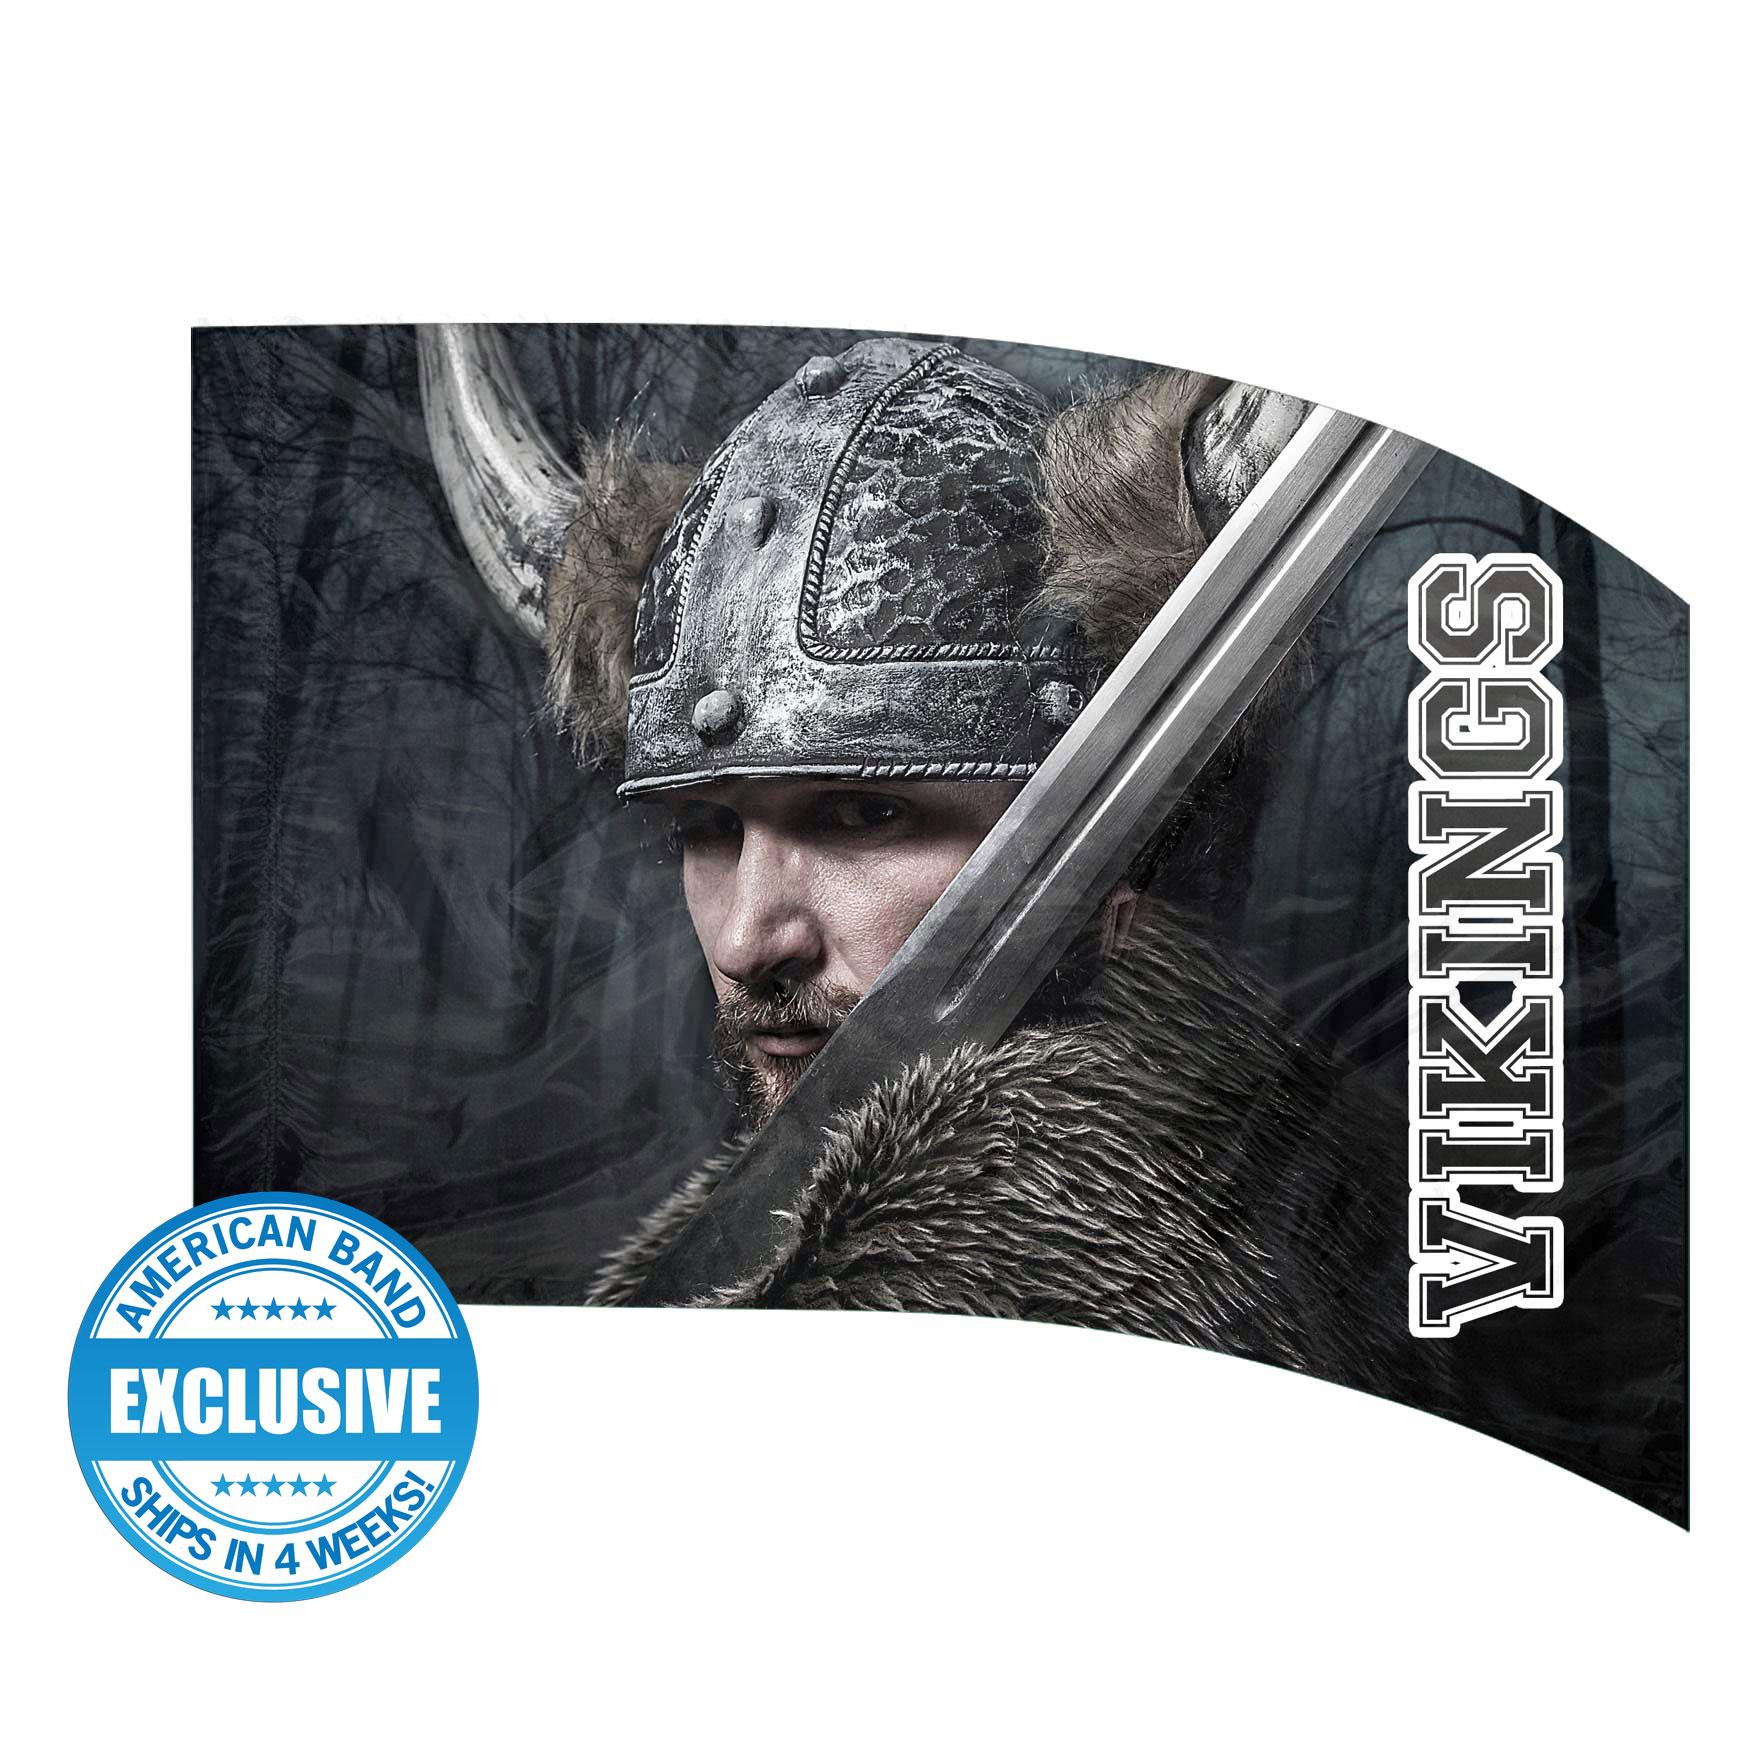 Made-to-Order Digital Mascot Flags - Viking